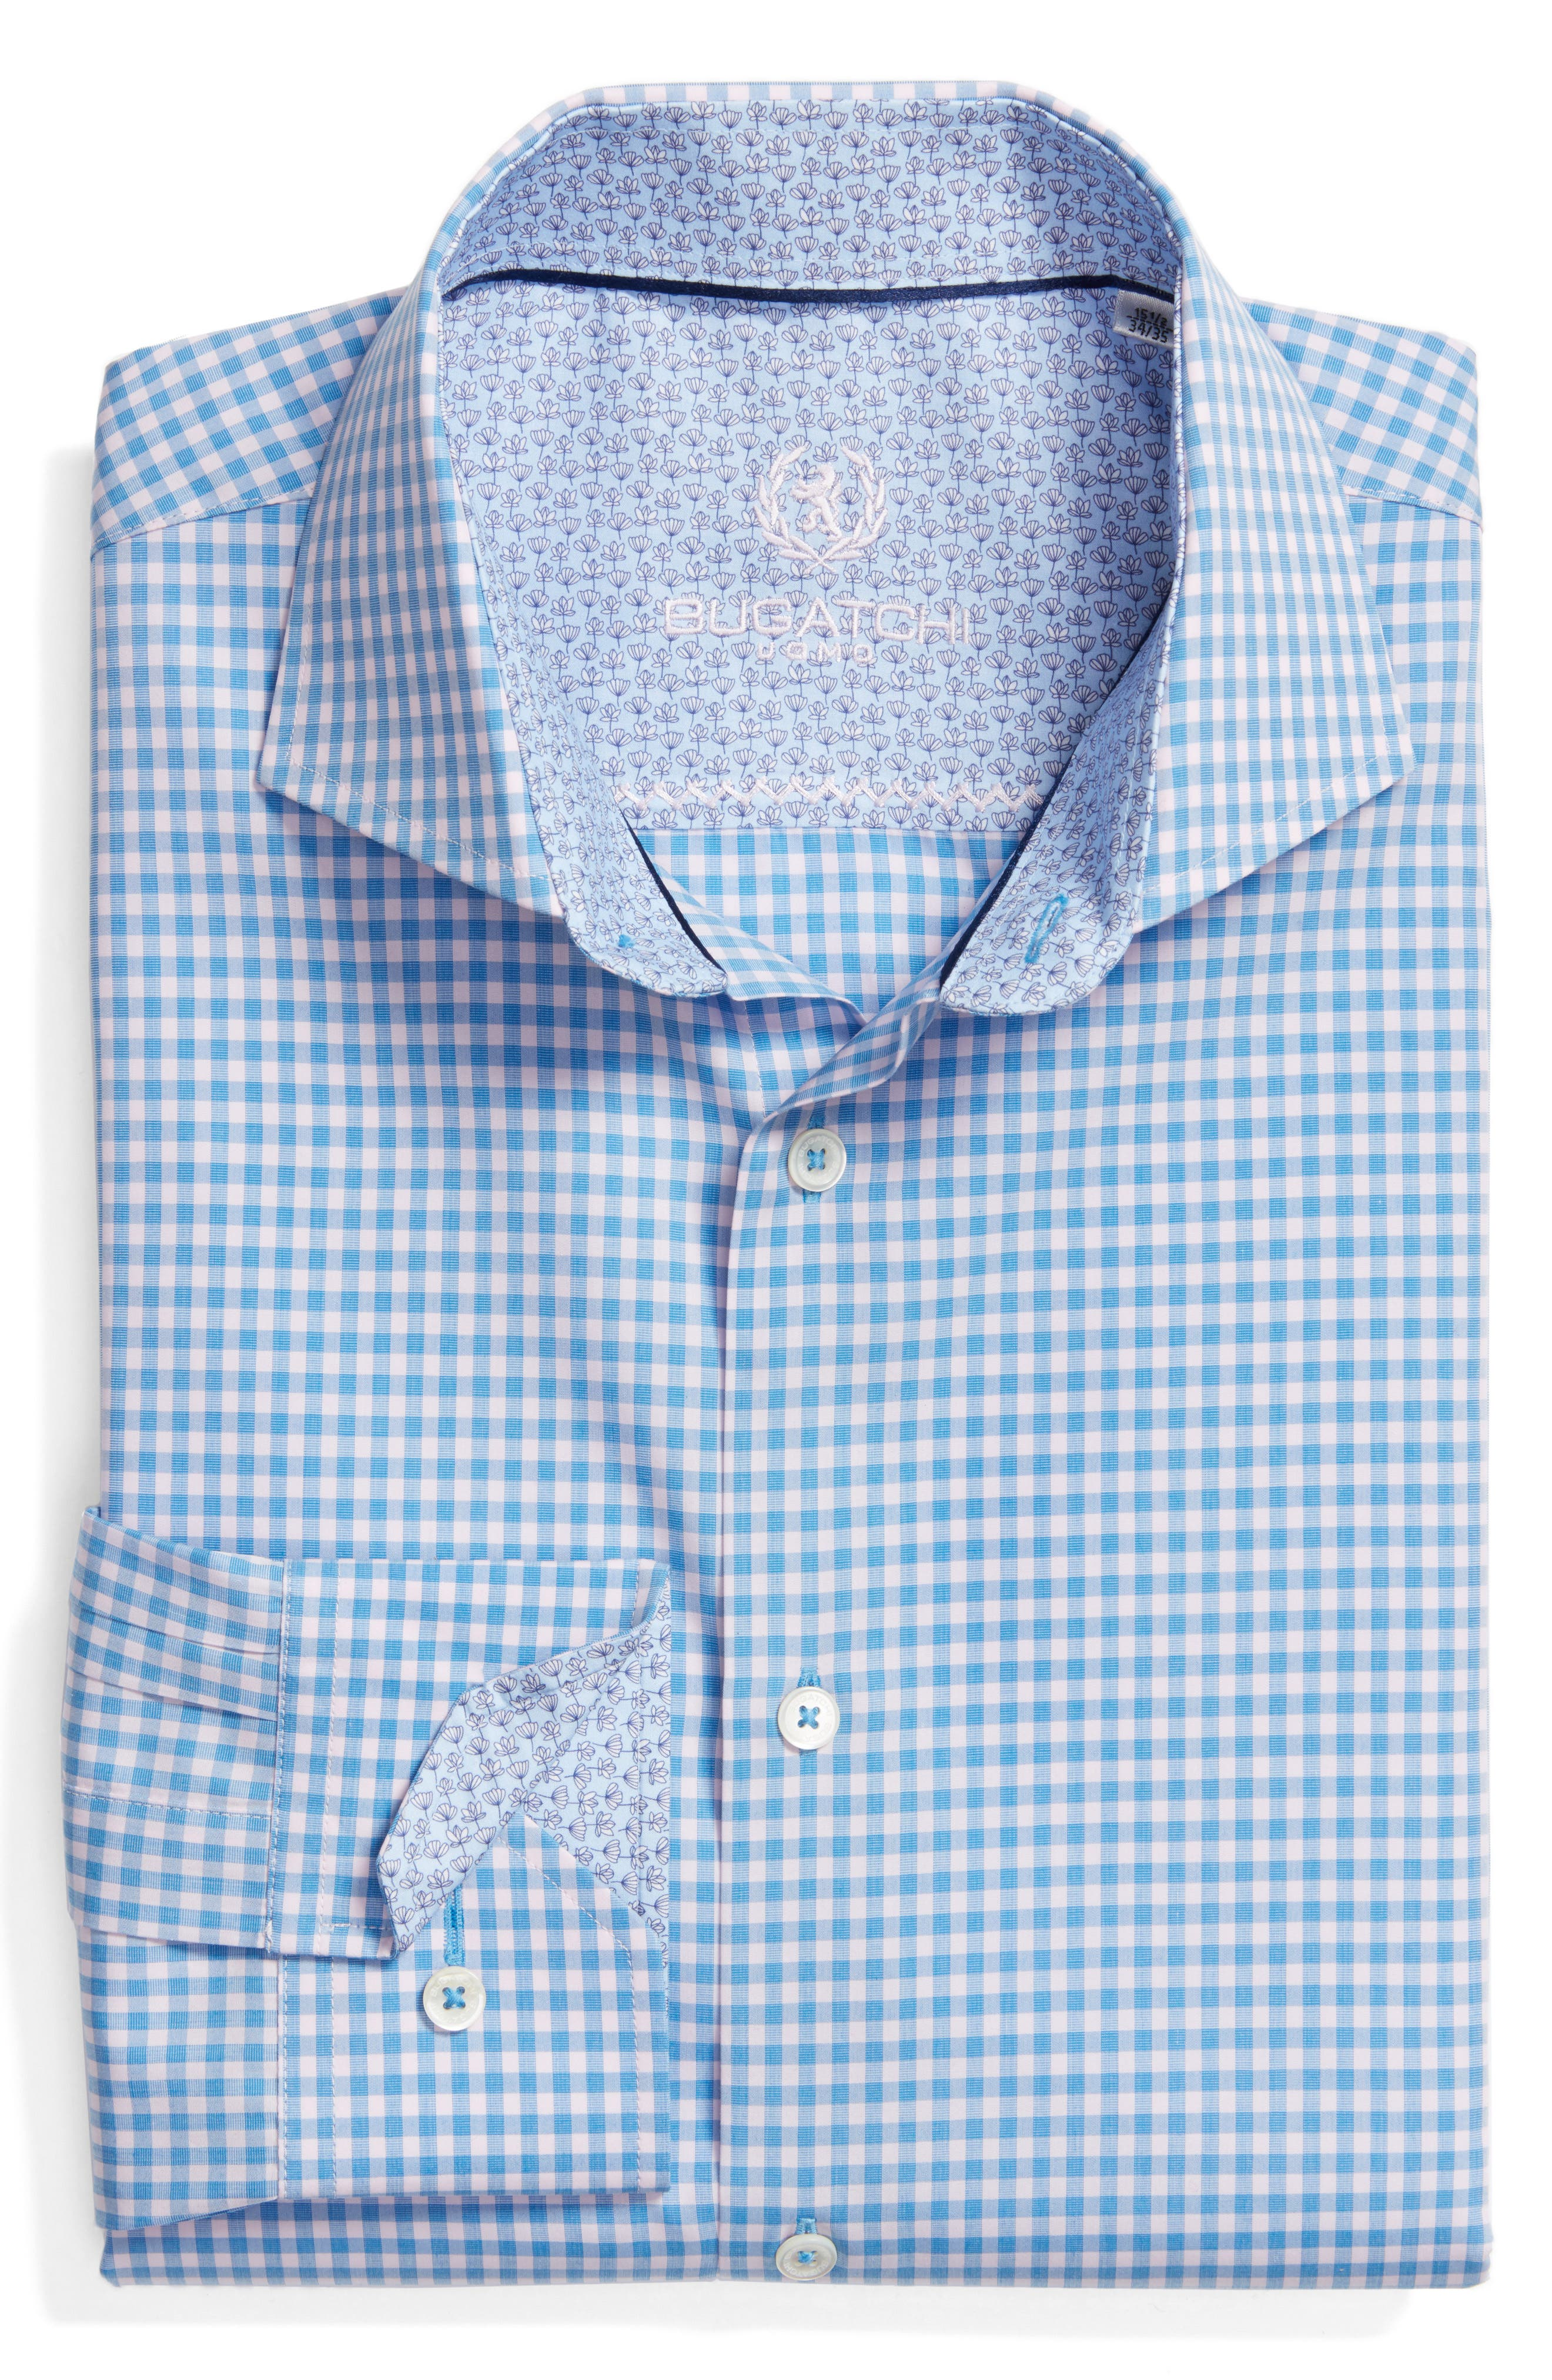 Trim Fit Check Dress Shirt,                             Main thumbnail 1, color,                             Air Blue